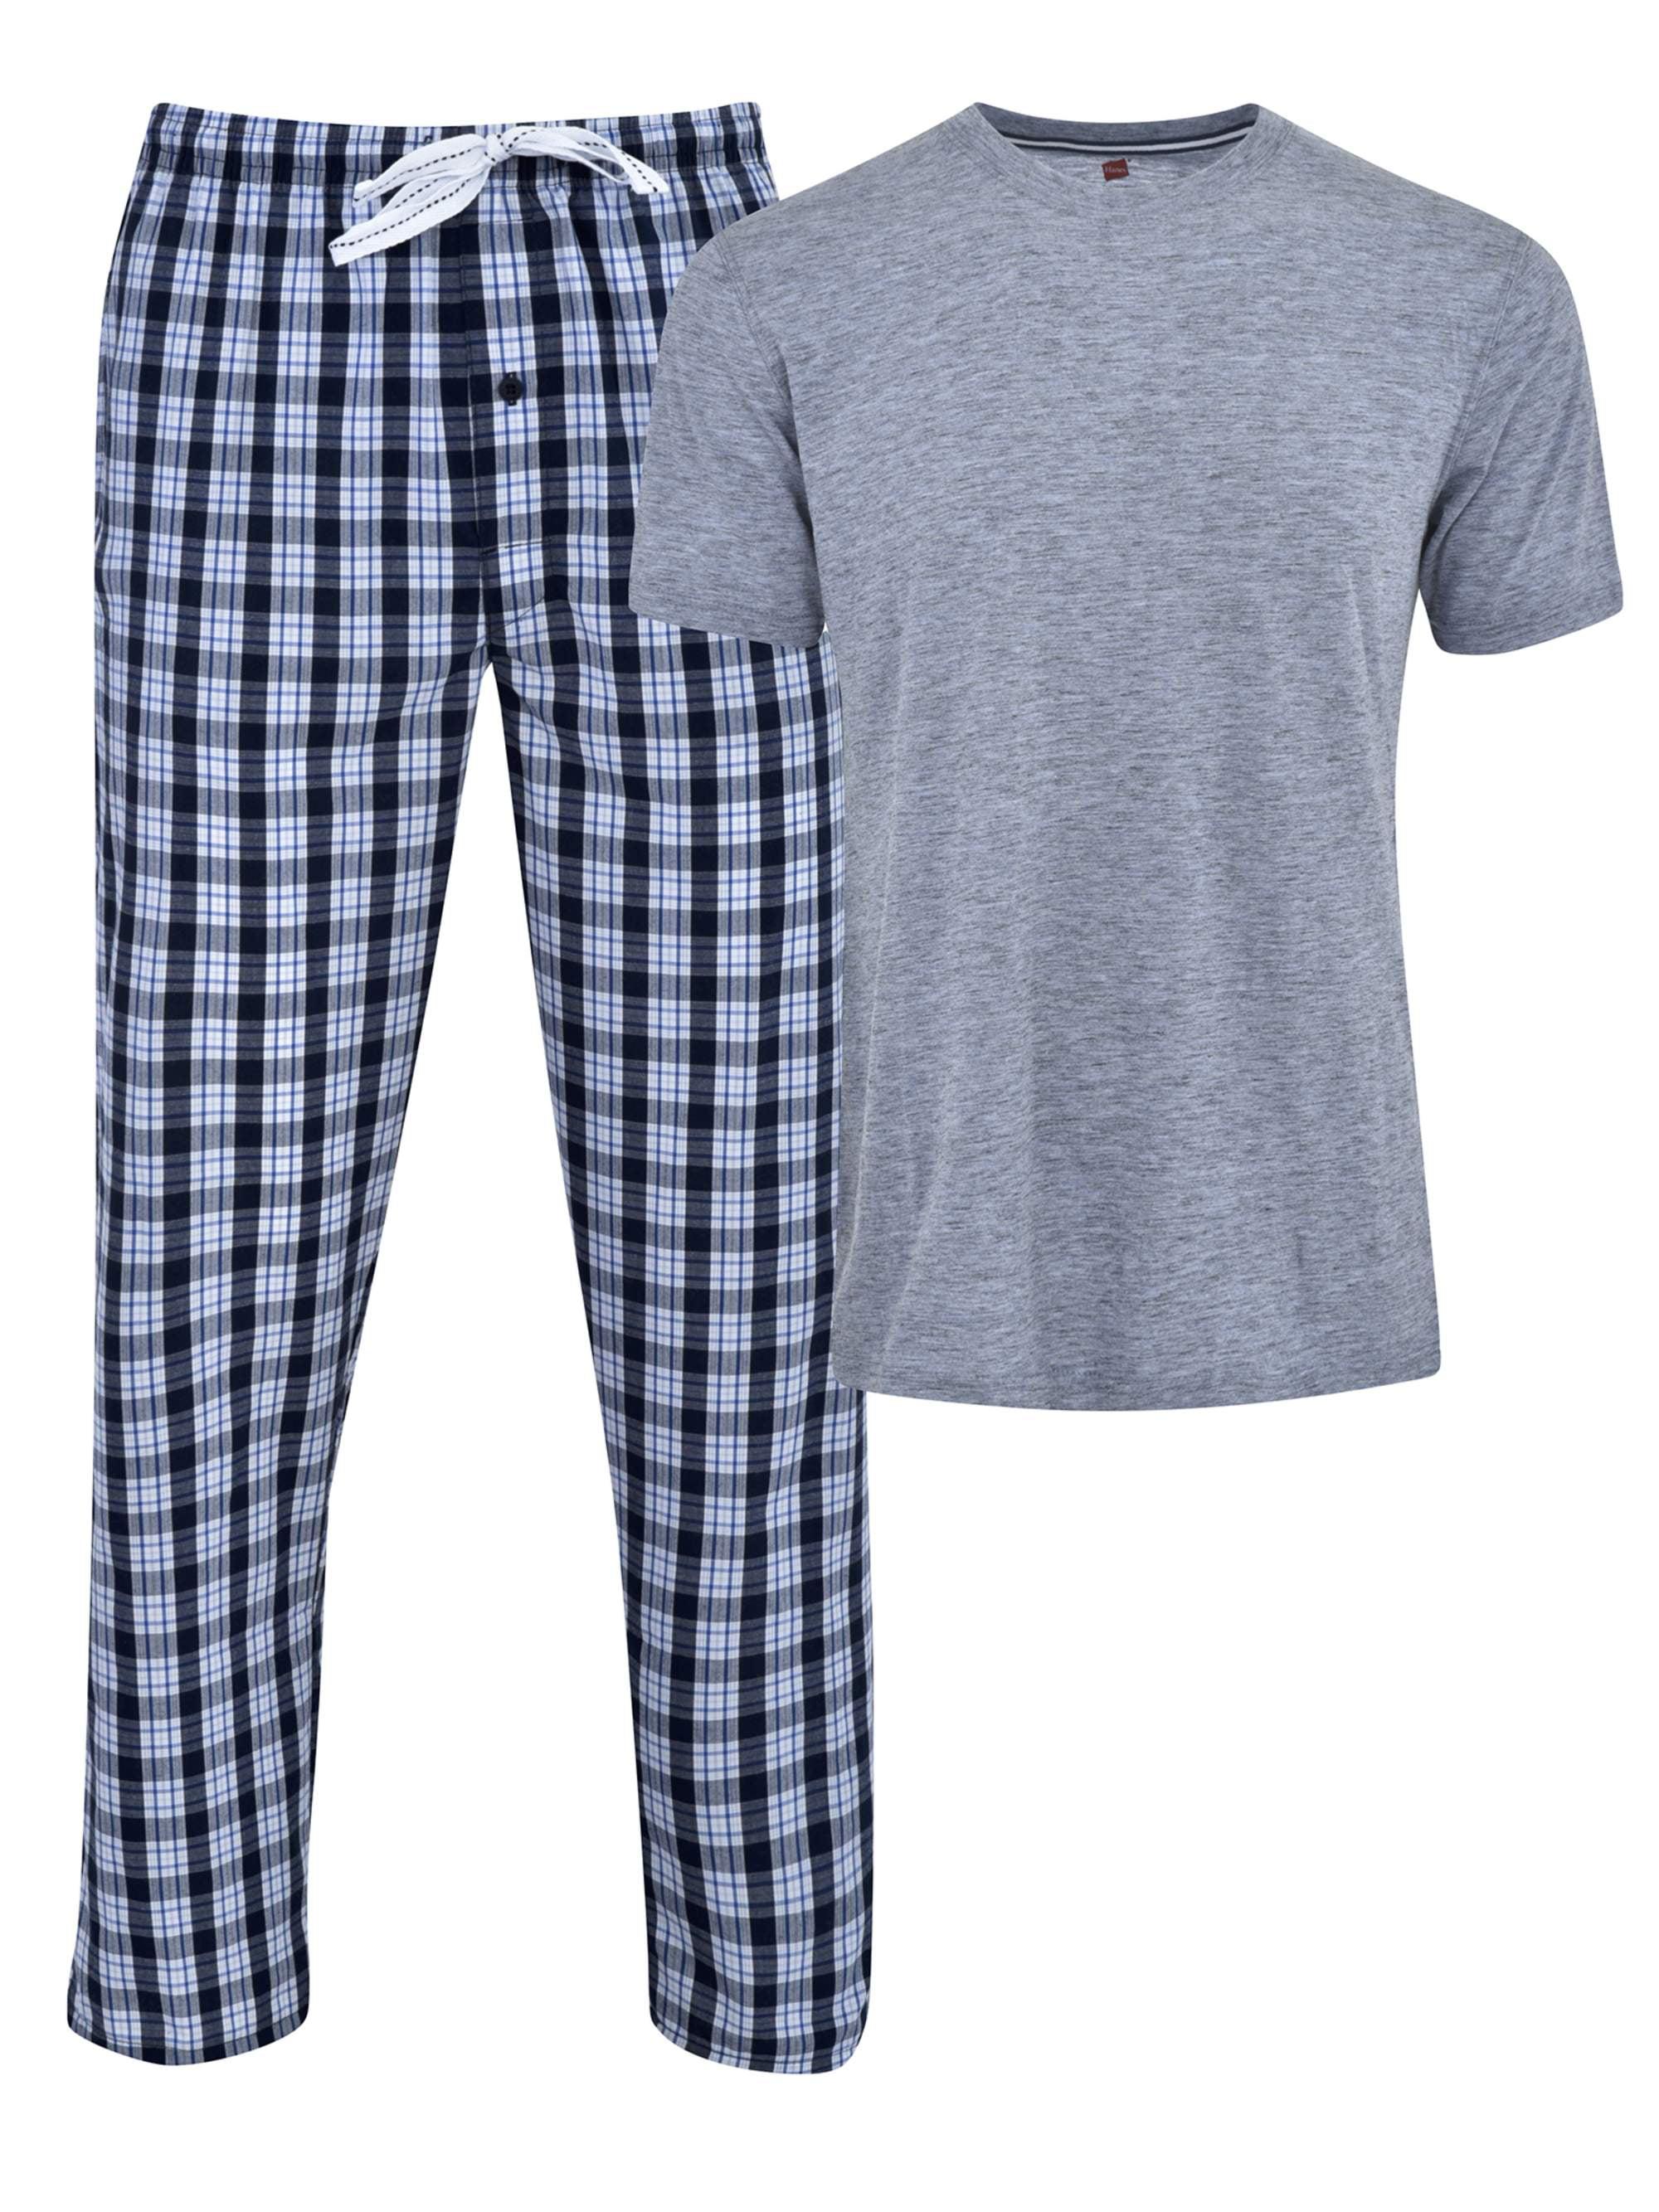 Men's Short Sleeve Crew Top With Woven Sleep Pant Set